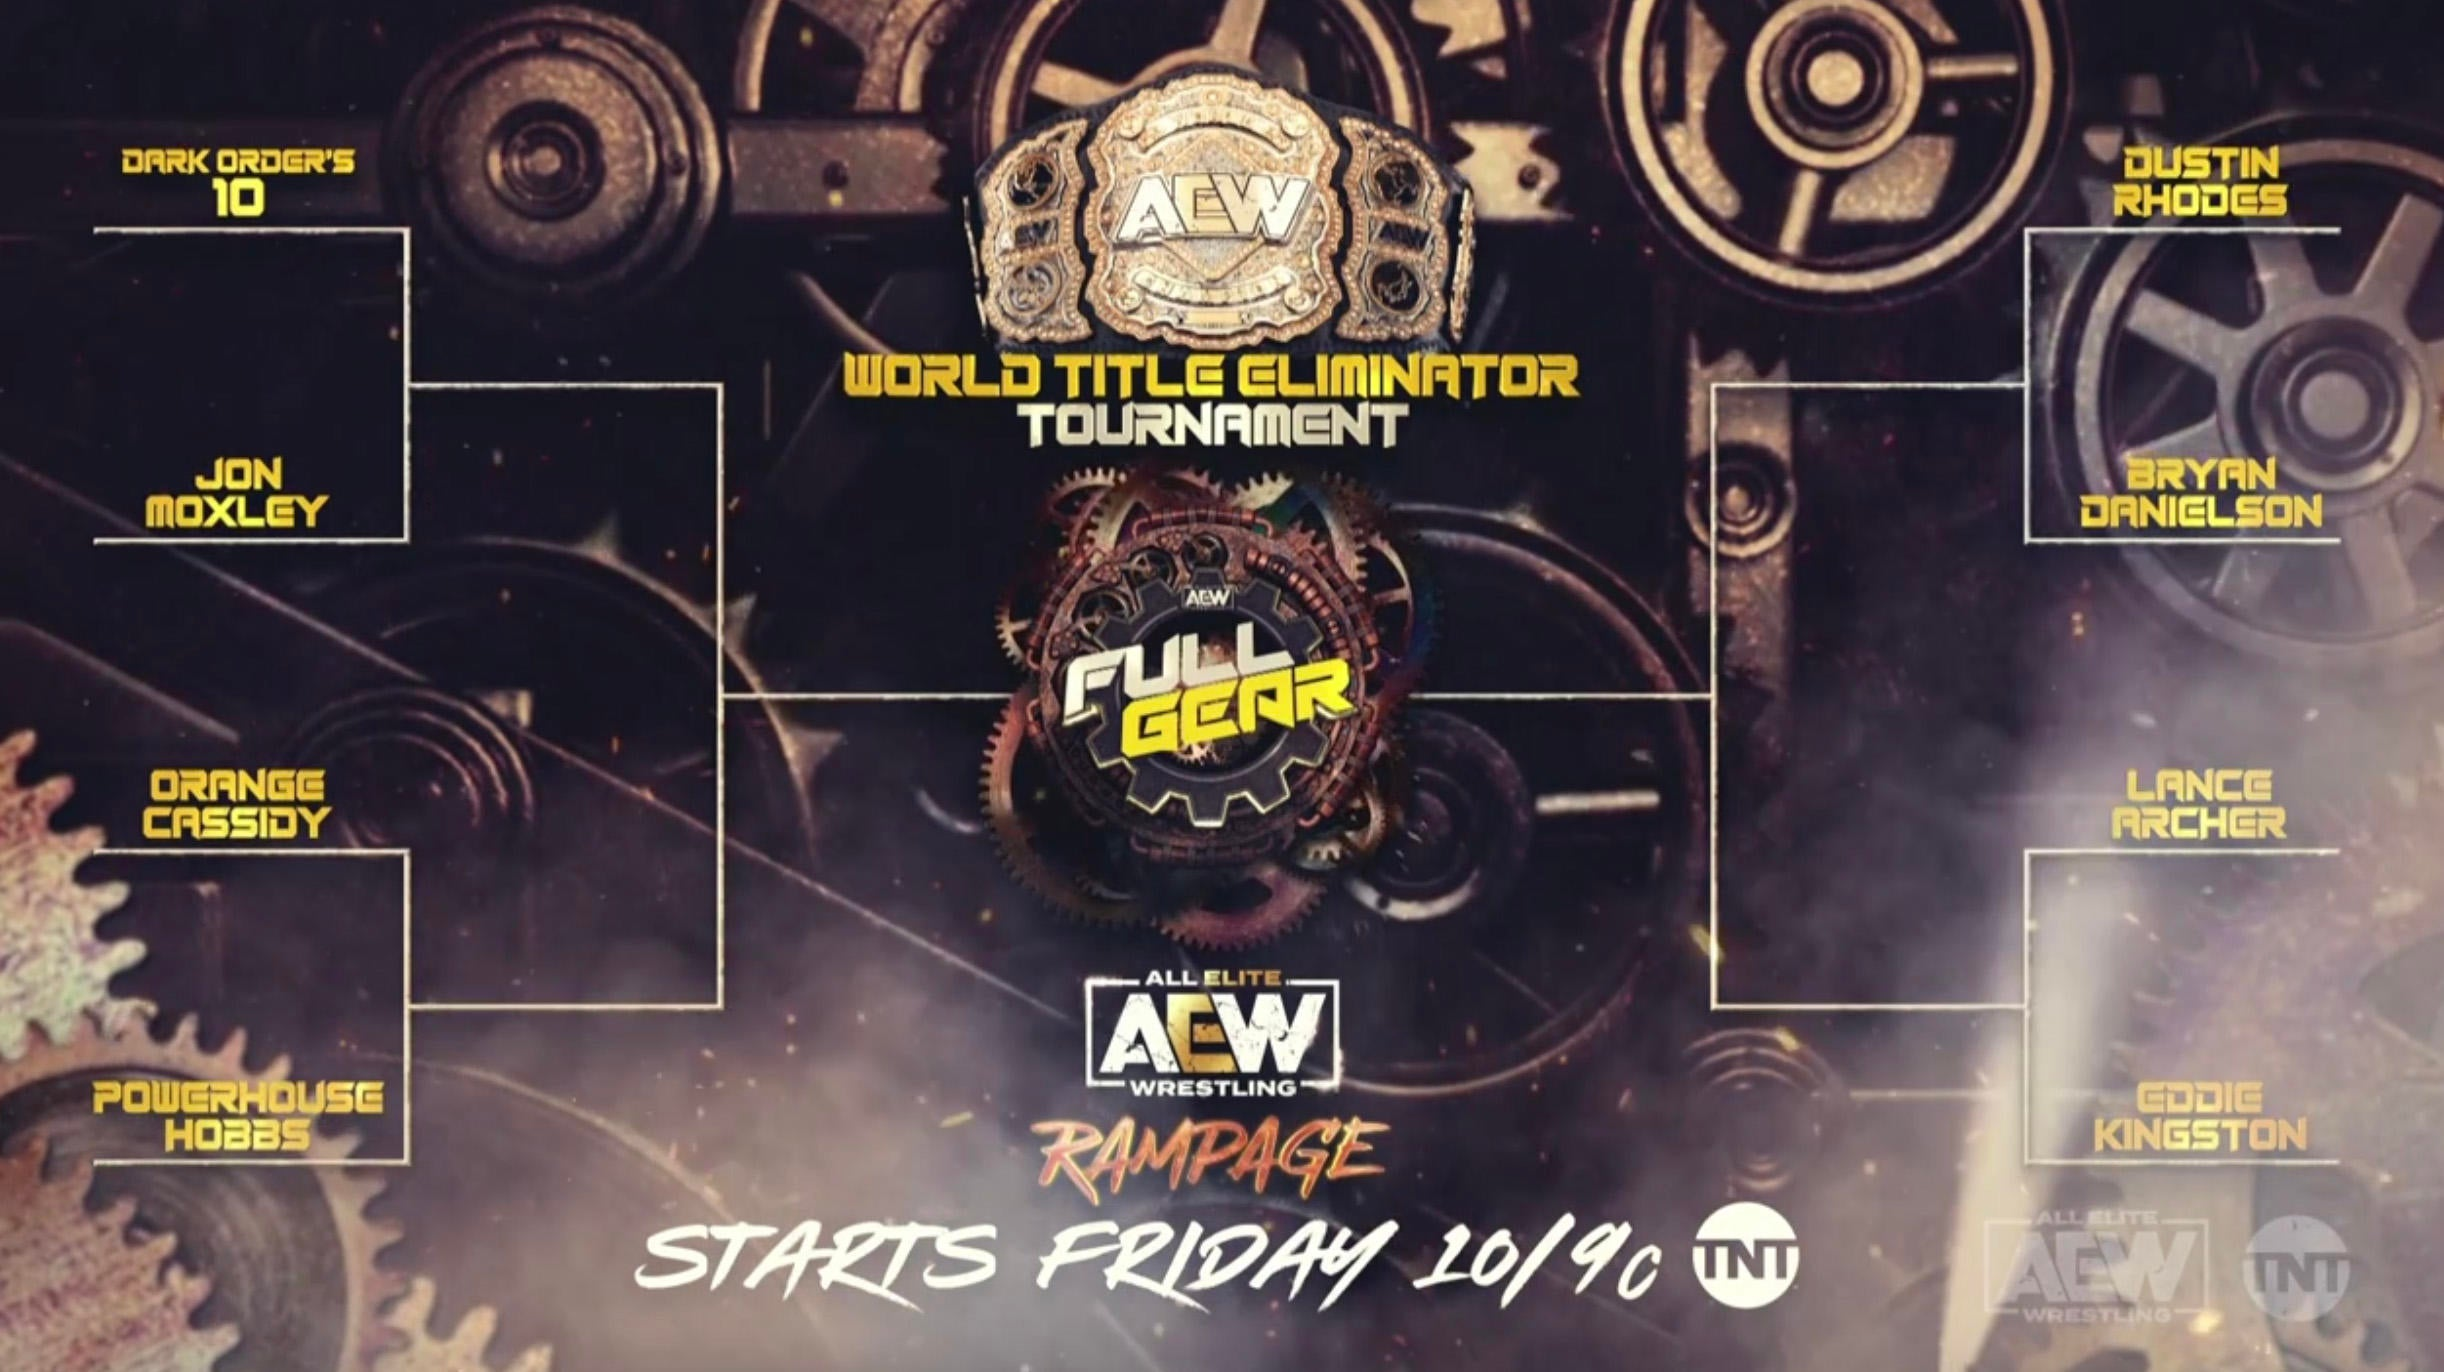 AEW Reveals World Title Eliminator Tournament Bracket